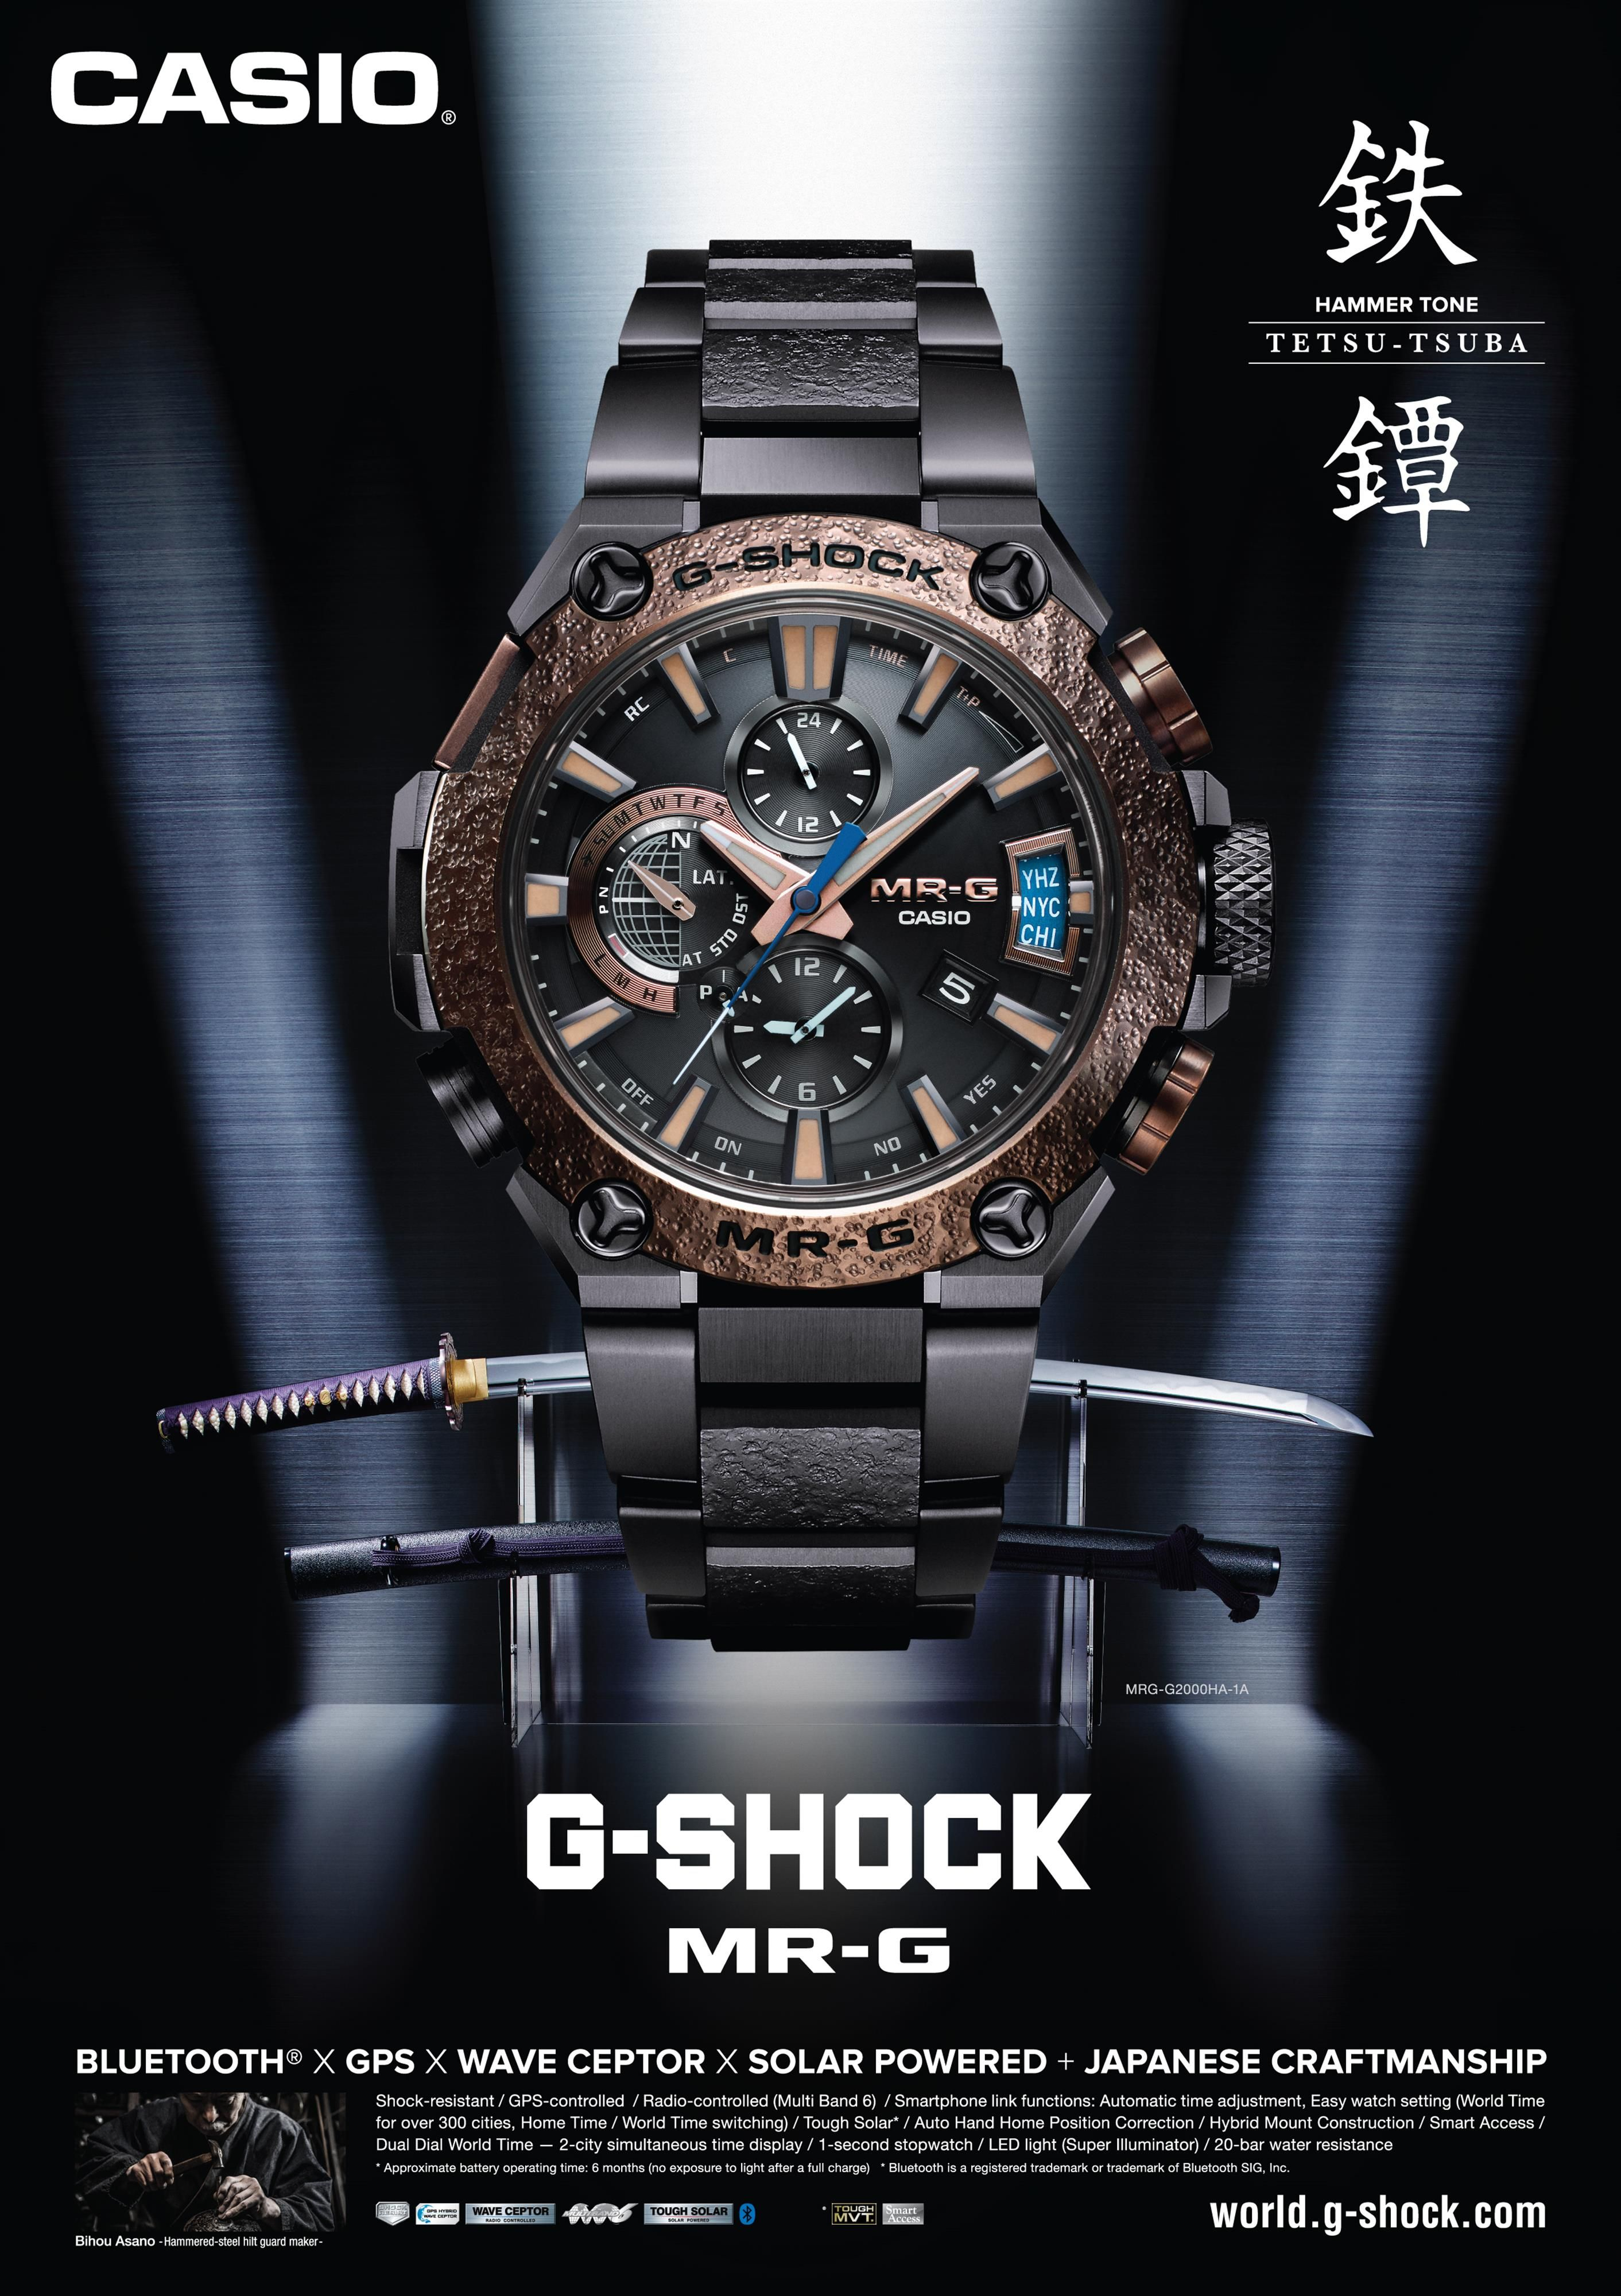 cbe4df3fb A new stylish design to re launched Gshock | Aleejan en 2019 | Reloj ...